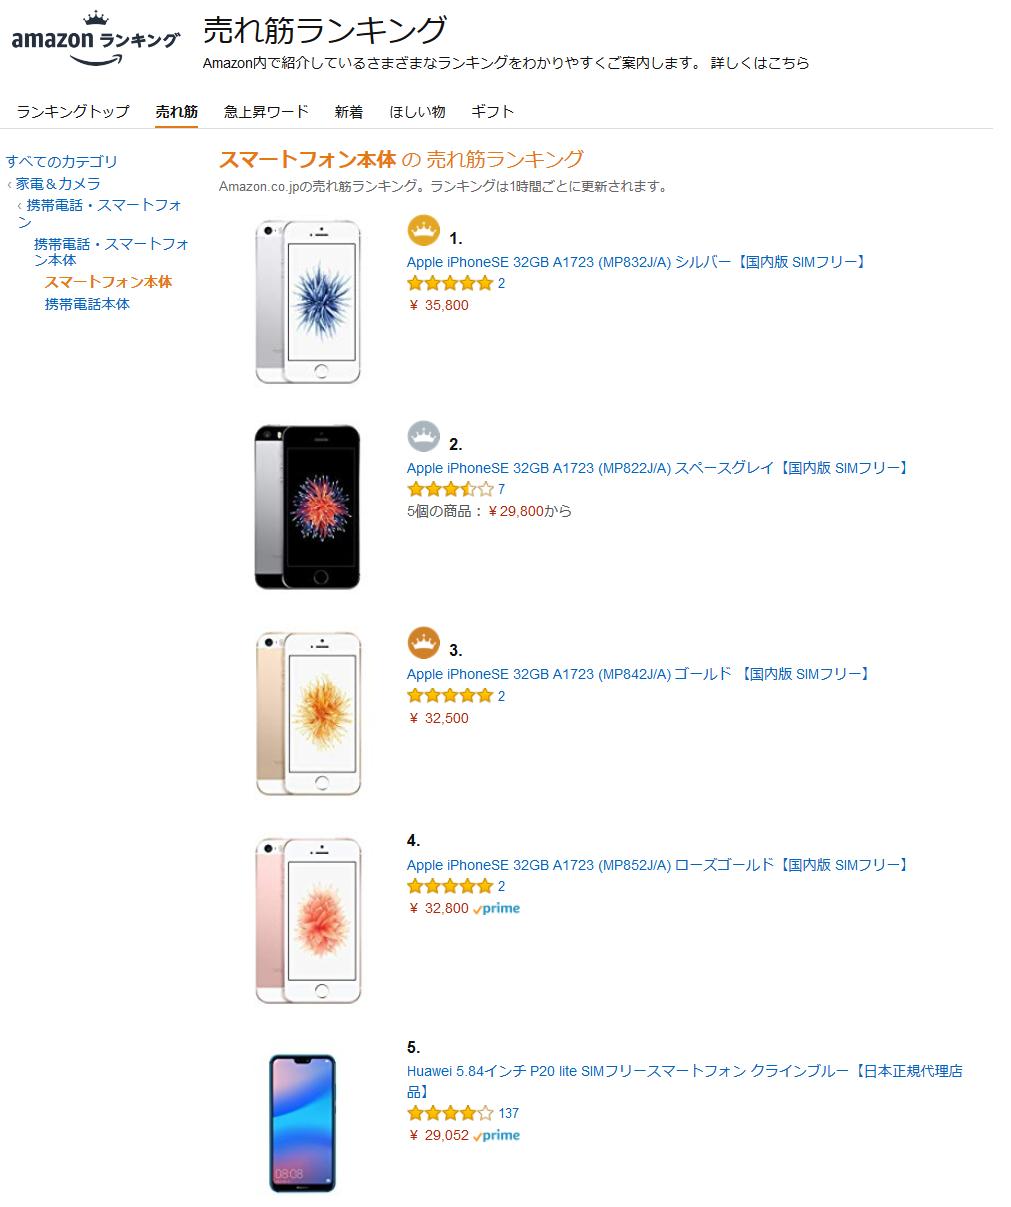 2018-09-14 Amazon Smartphone Best Seller Ranking